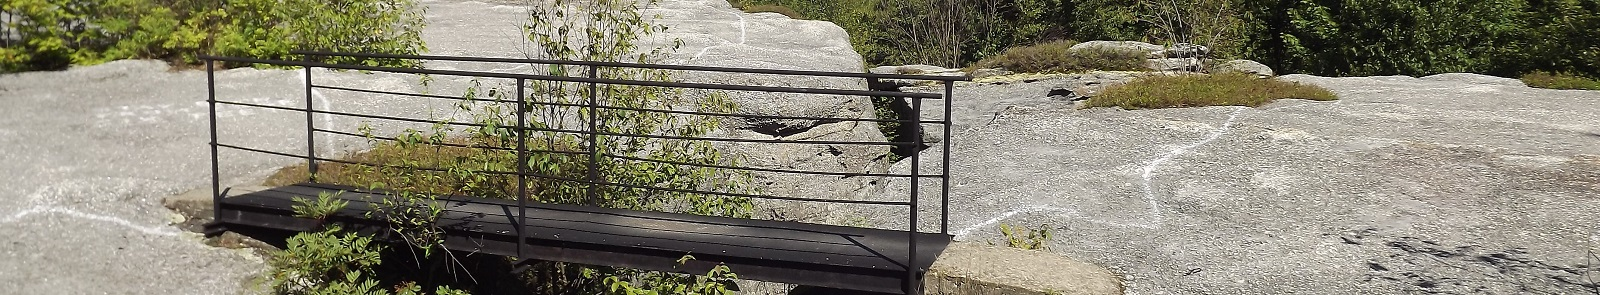 Close-Up of Metal Bridge Over Gap